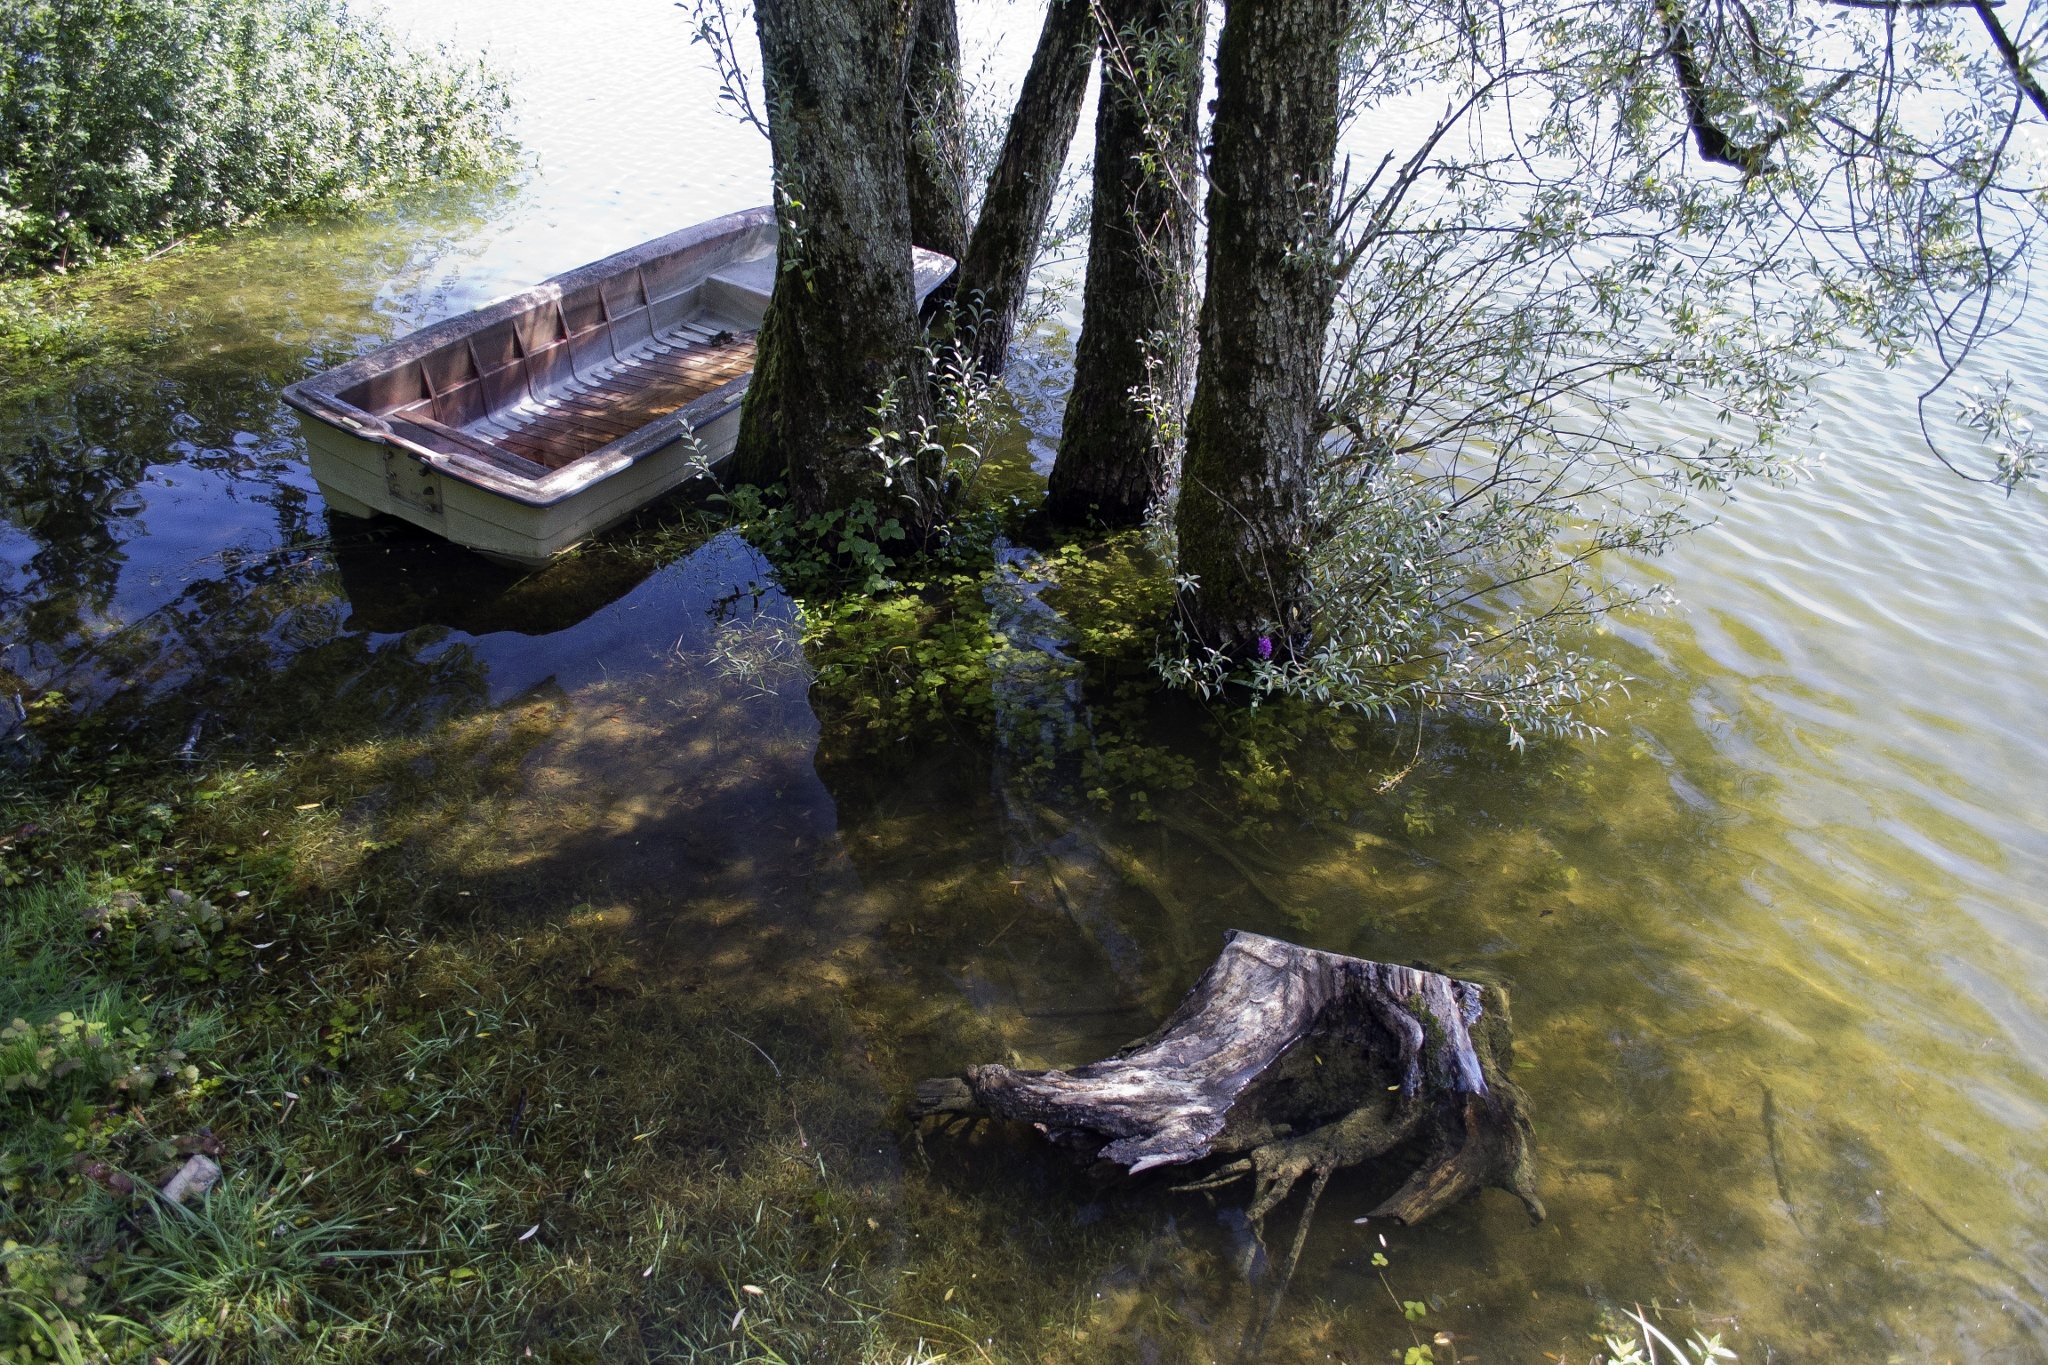 Boat at Lac de Bret by MarieJirousek